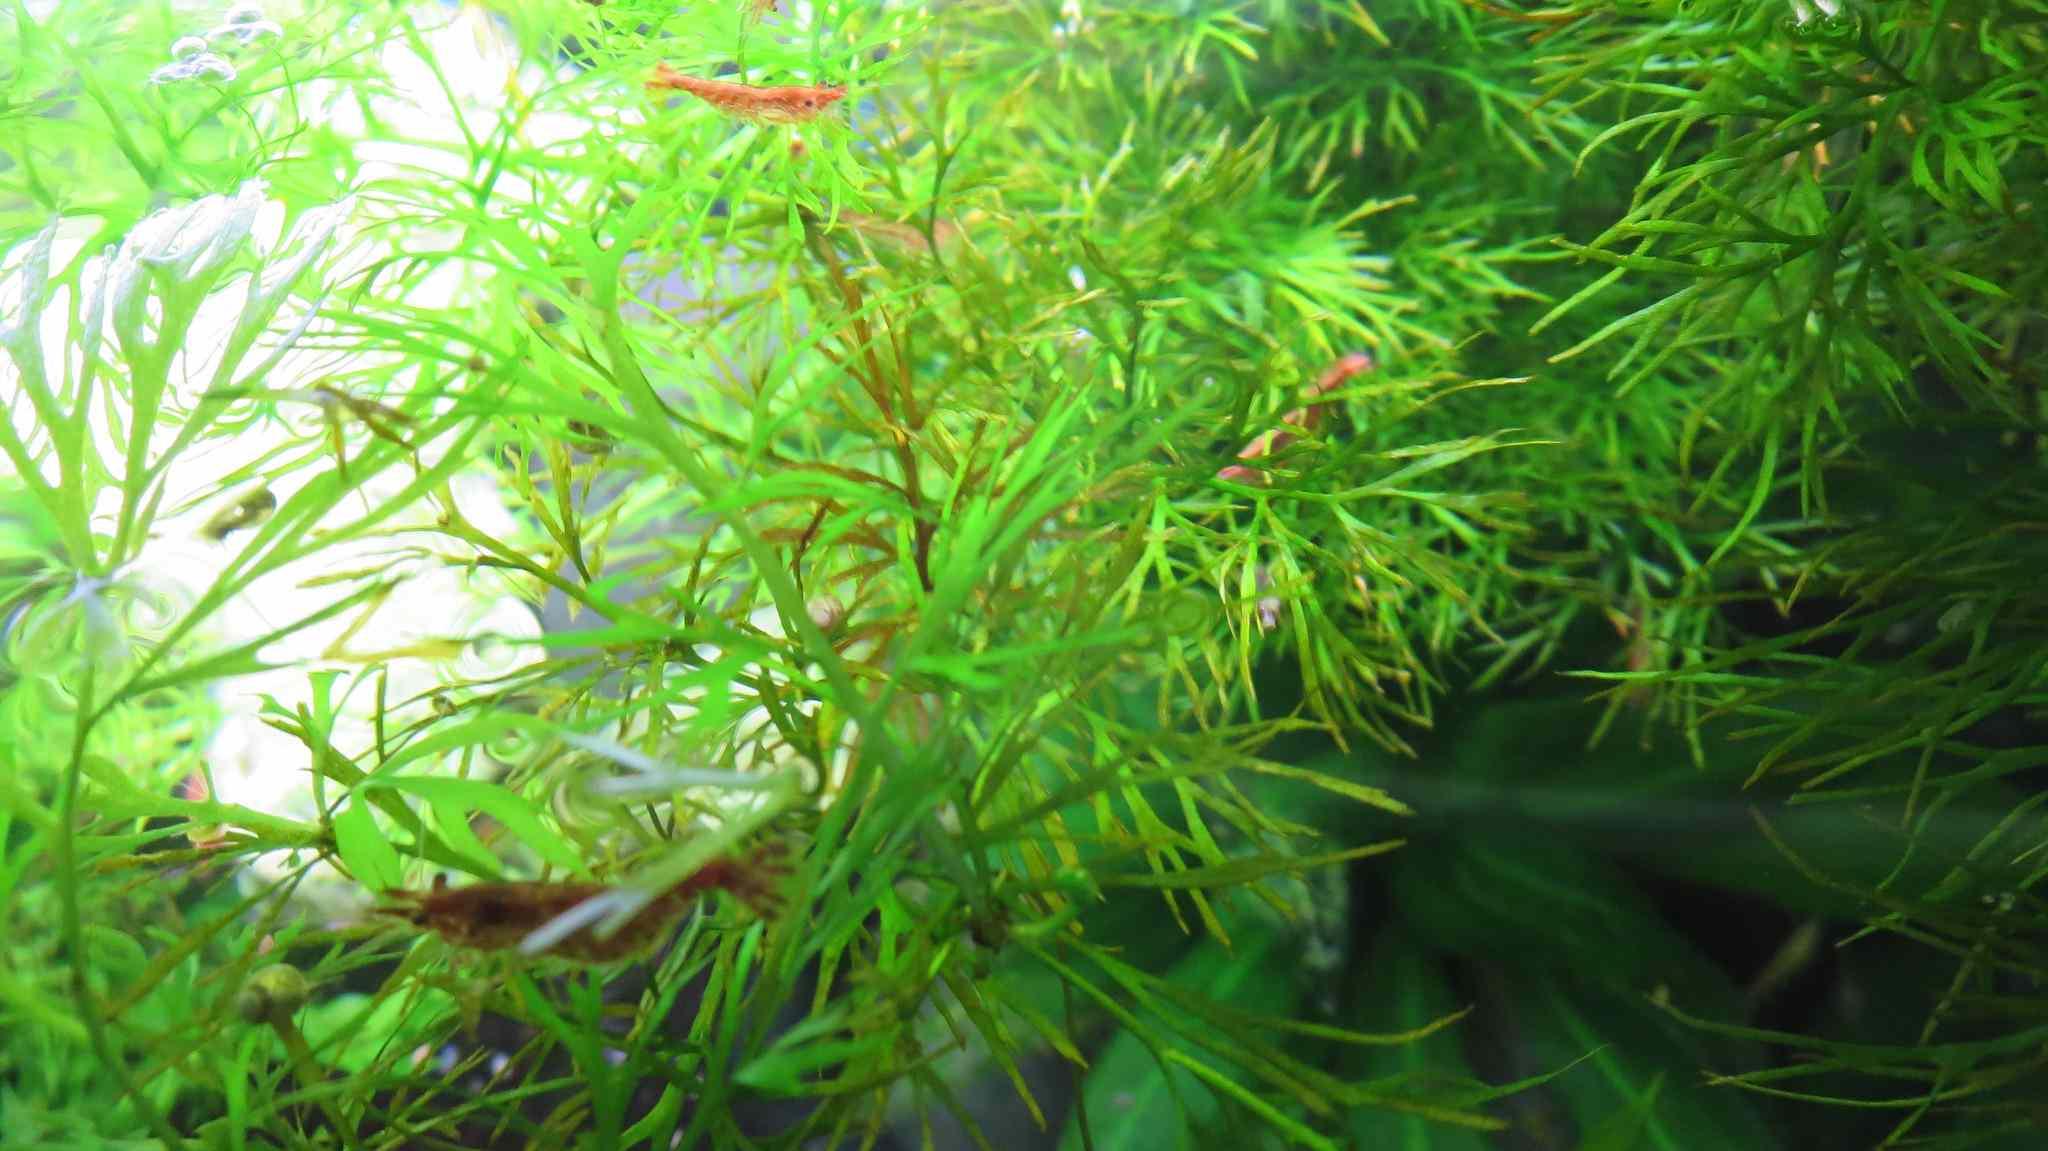 Shrimp in water sprite